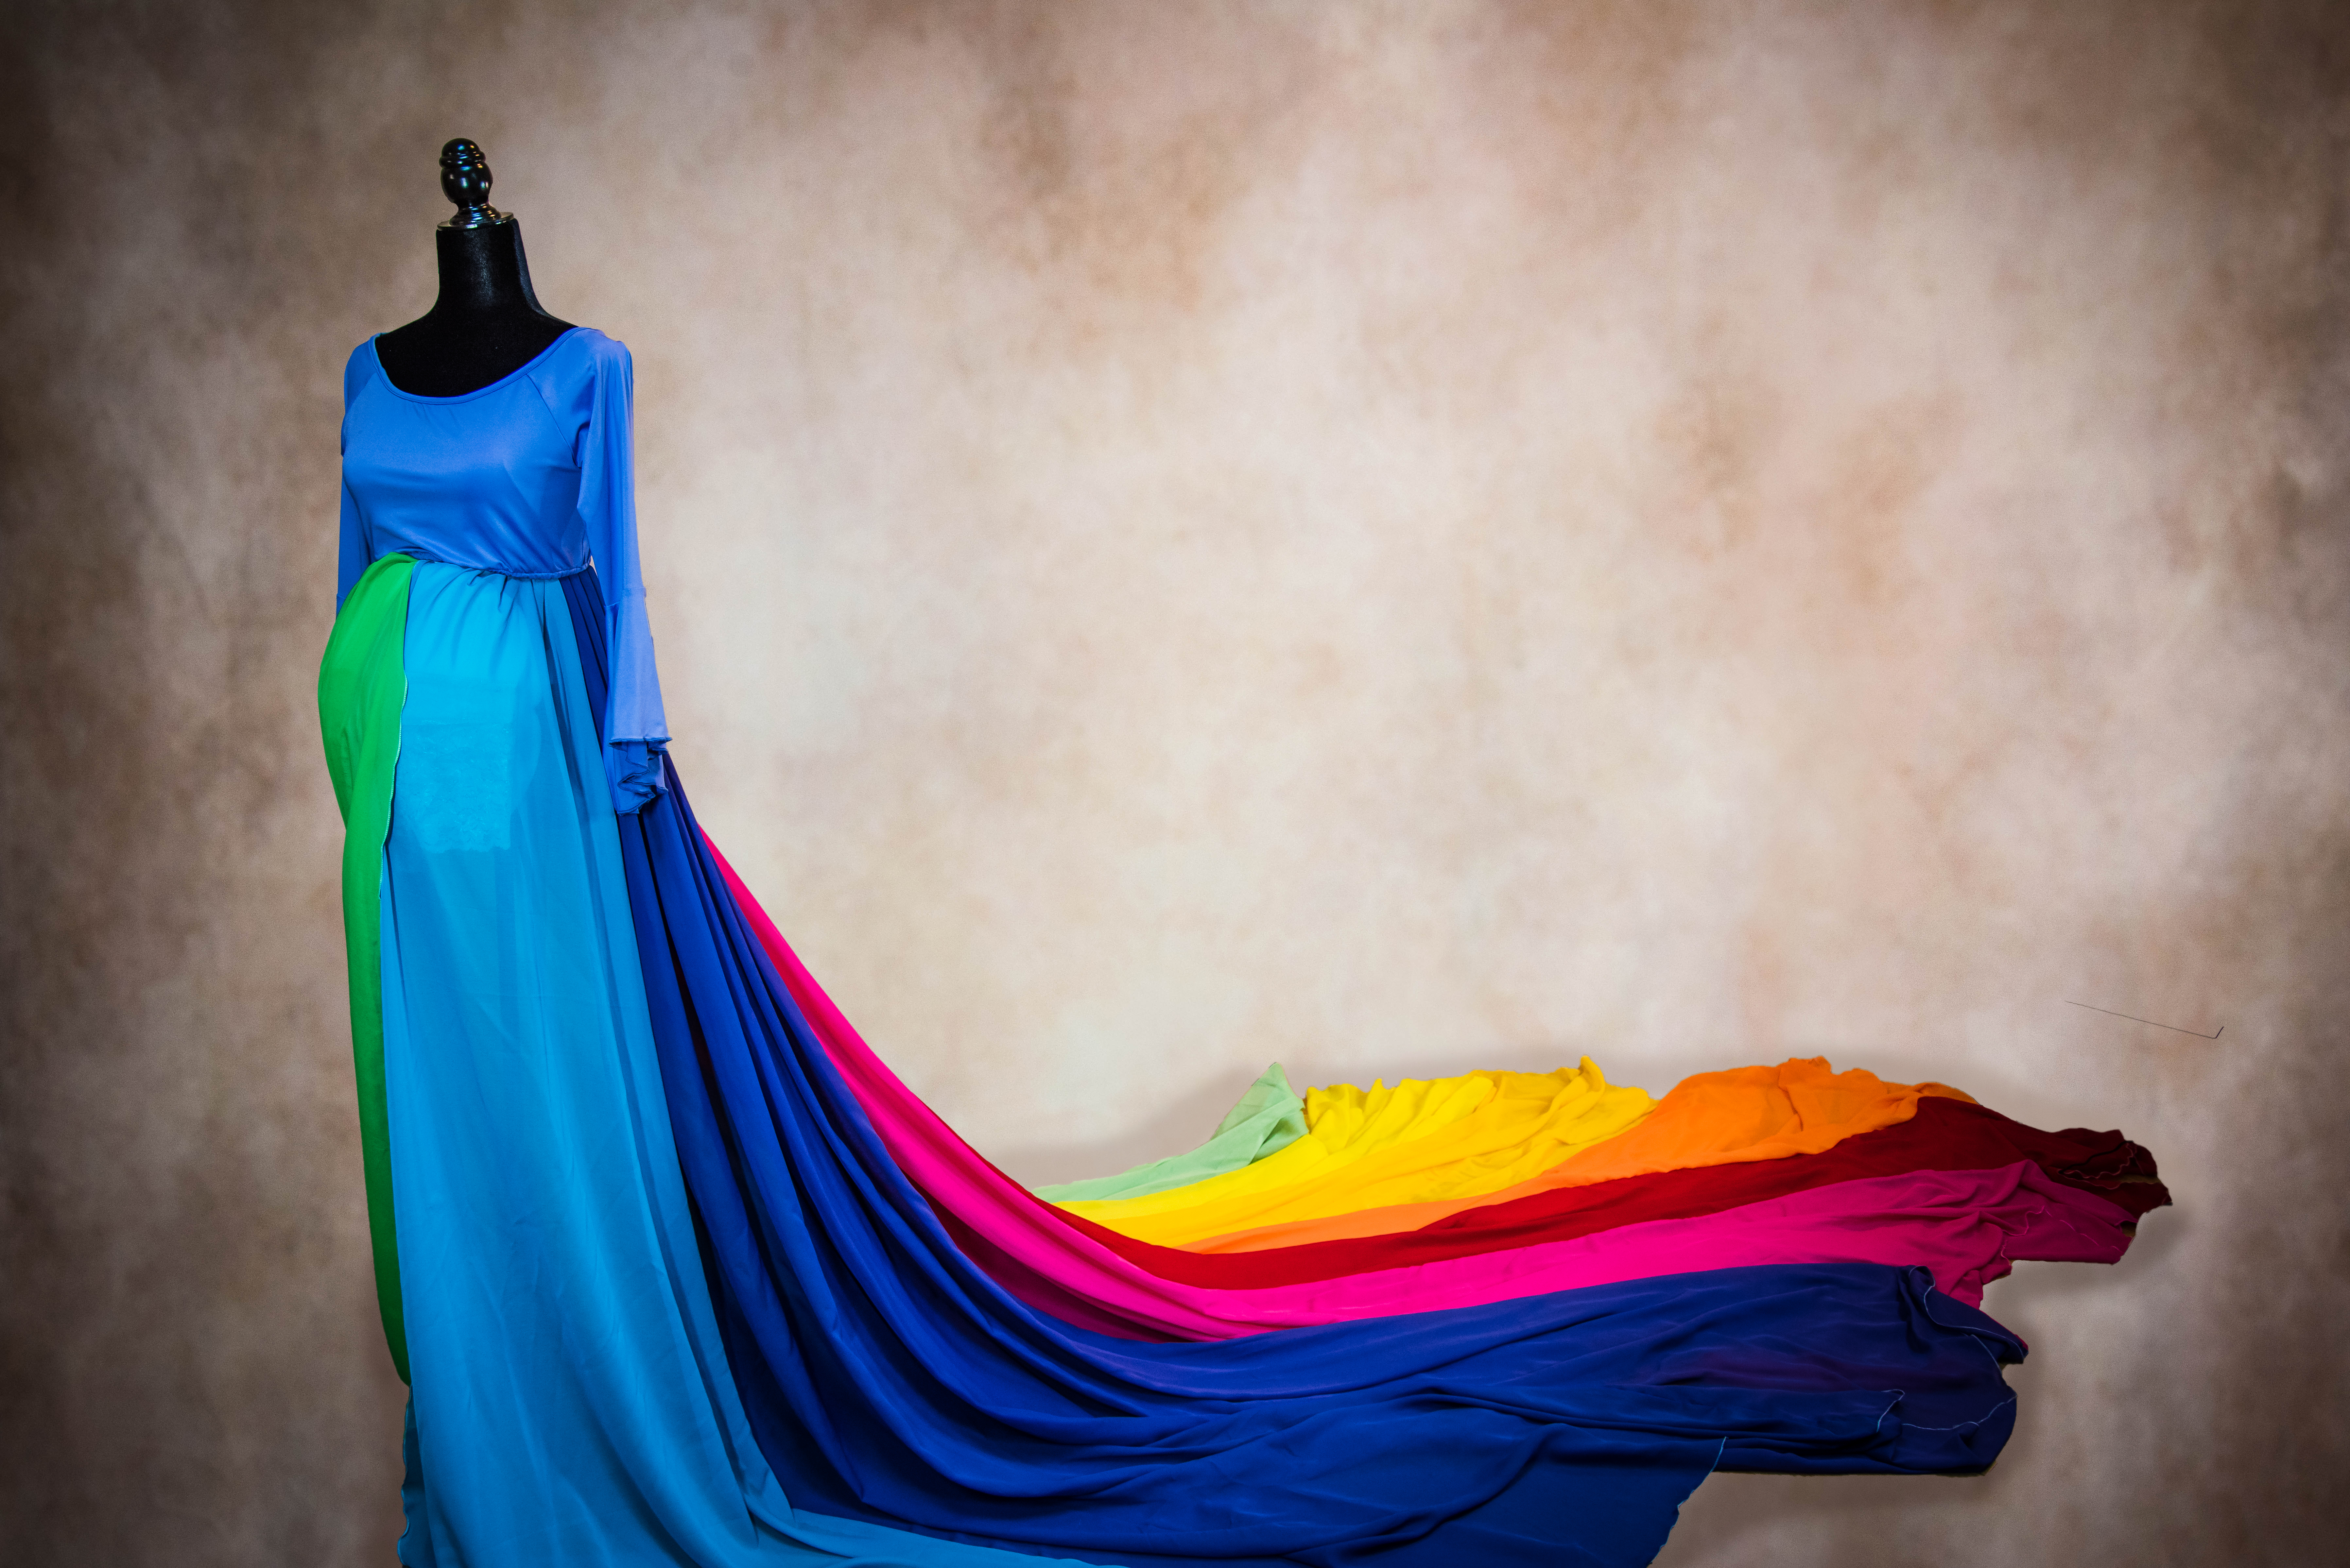 Rainbow Skirt with Blue Top